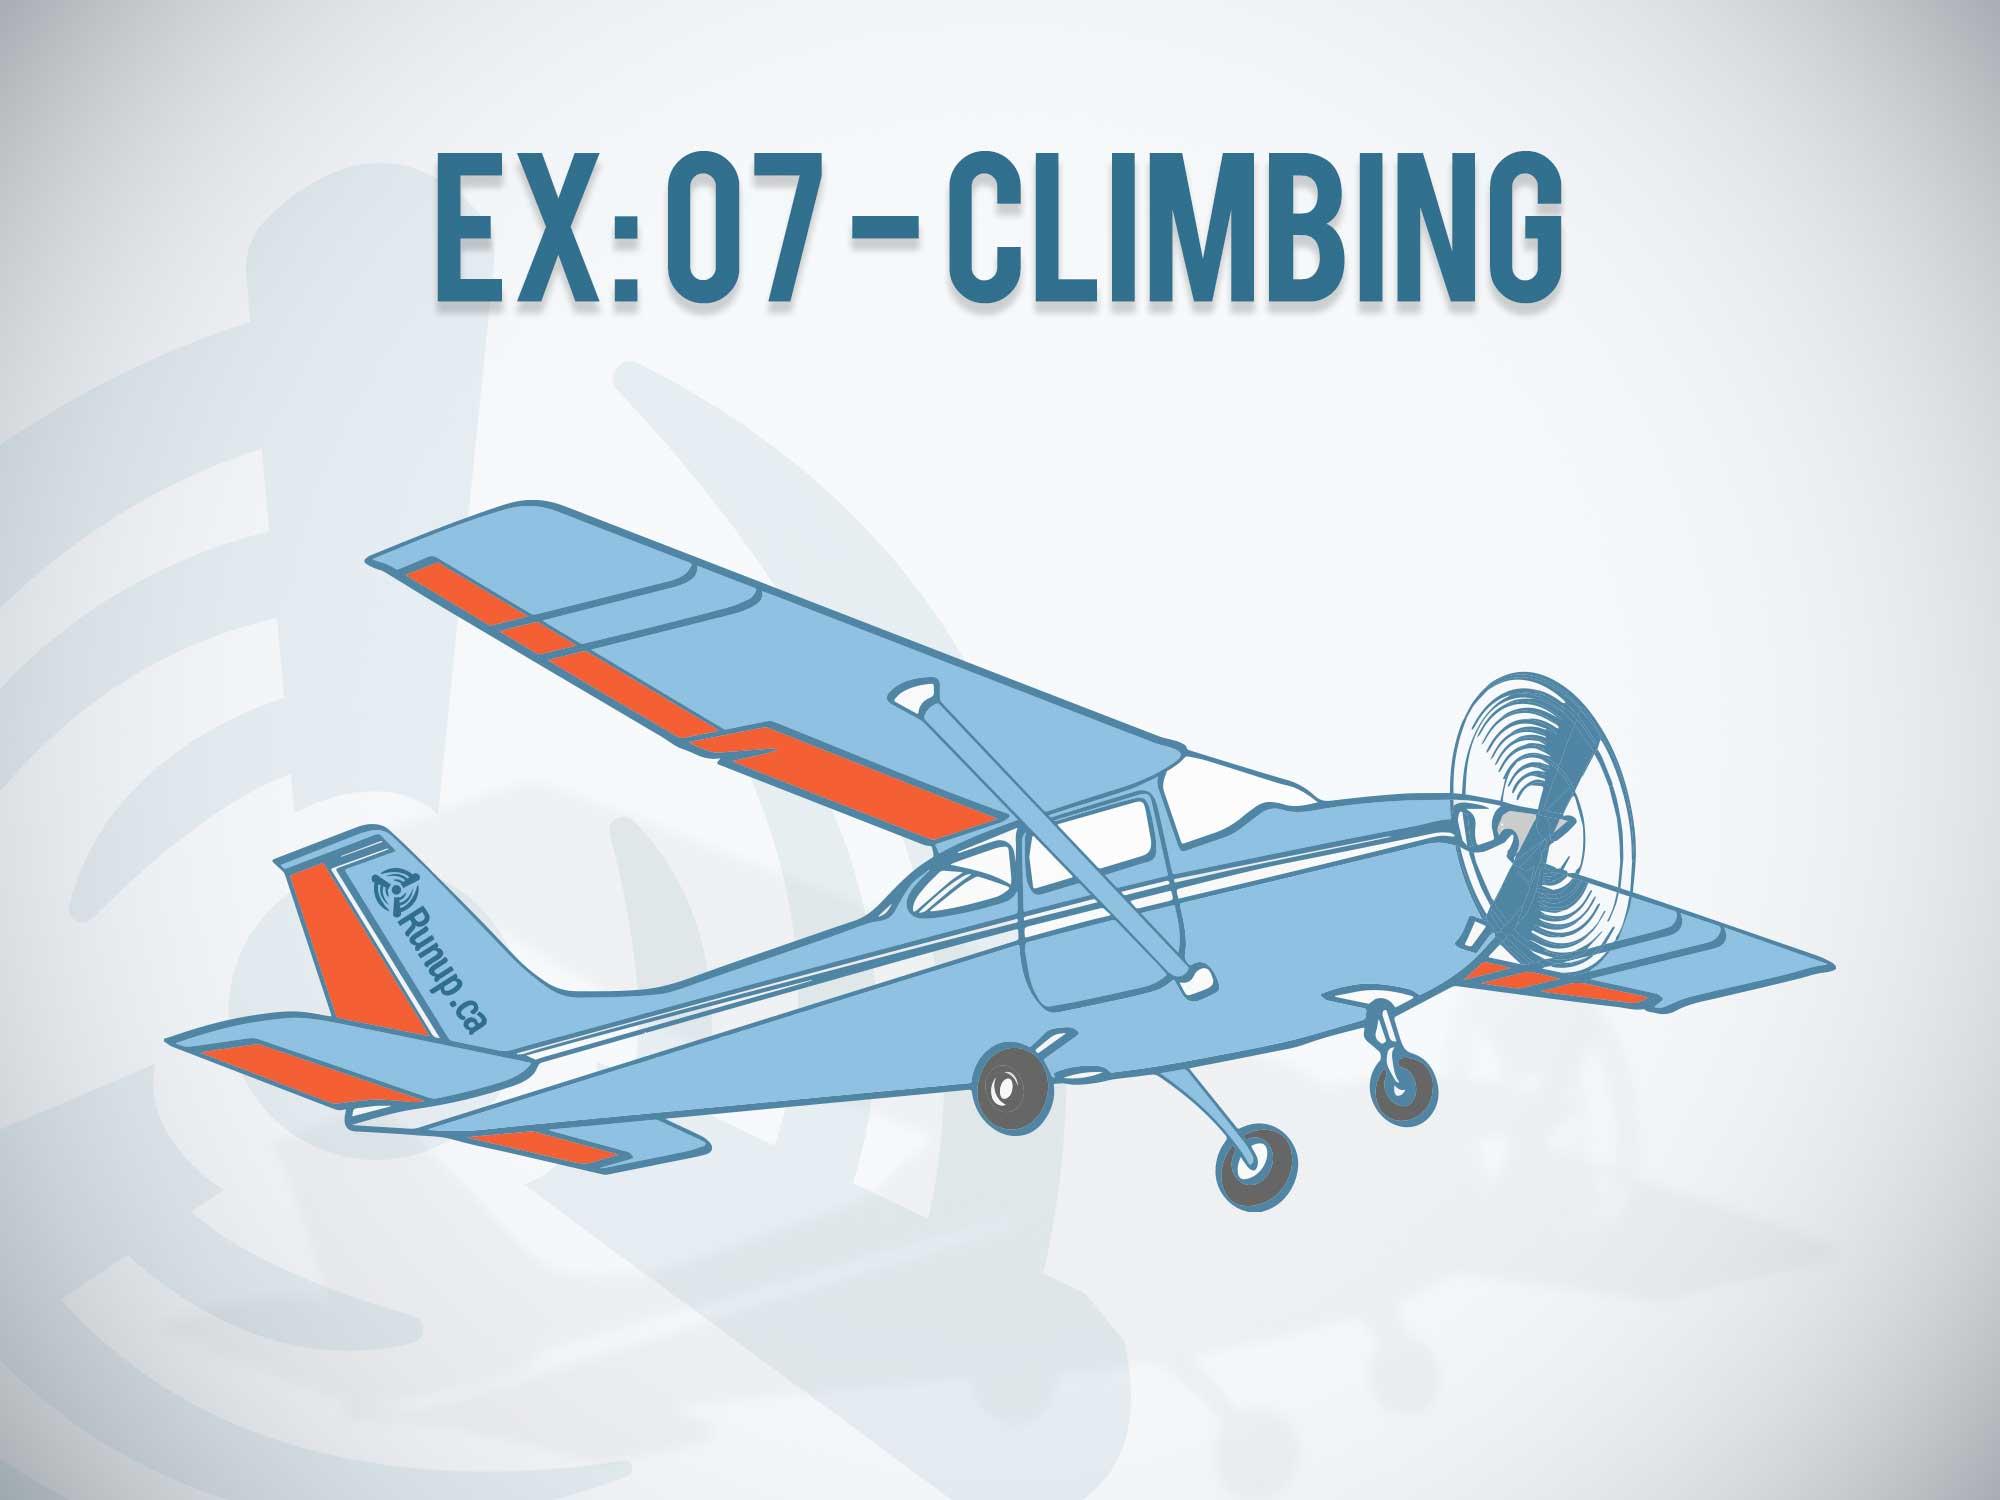 Canada Student Pilot - Exercise 5 Climbing